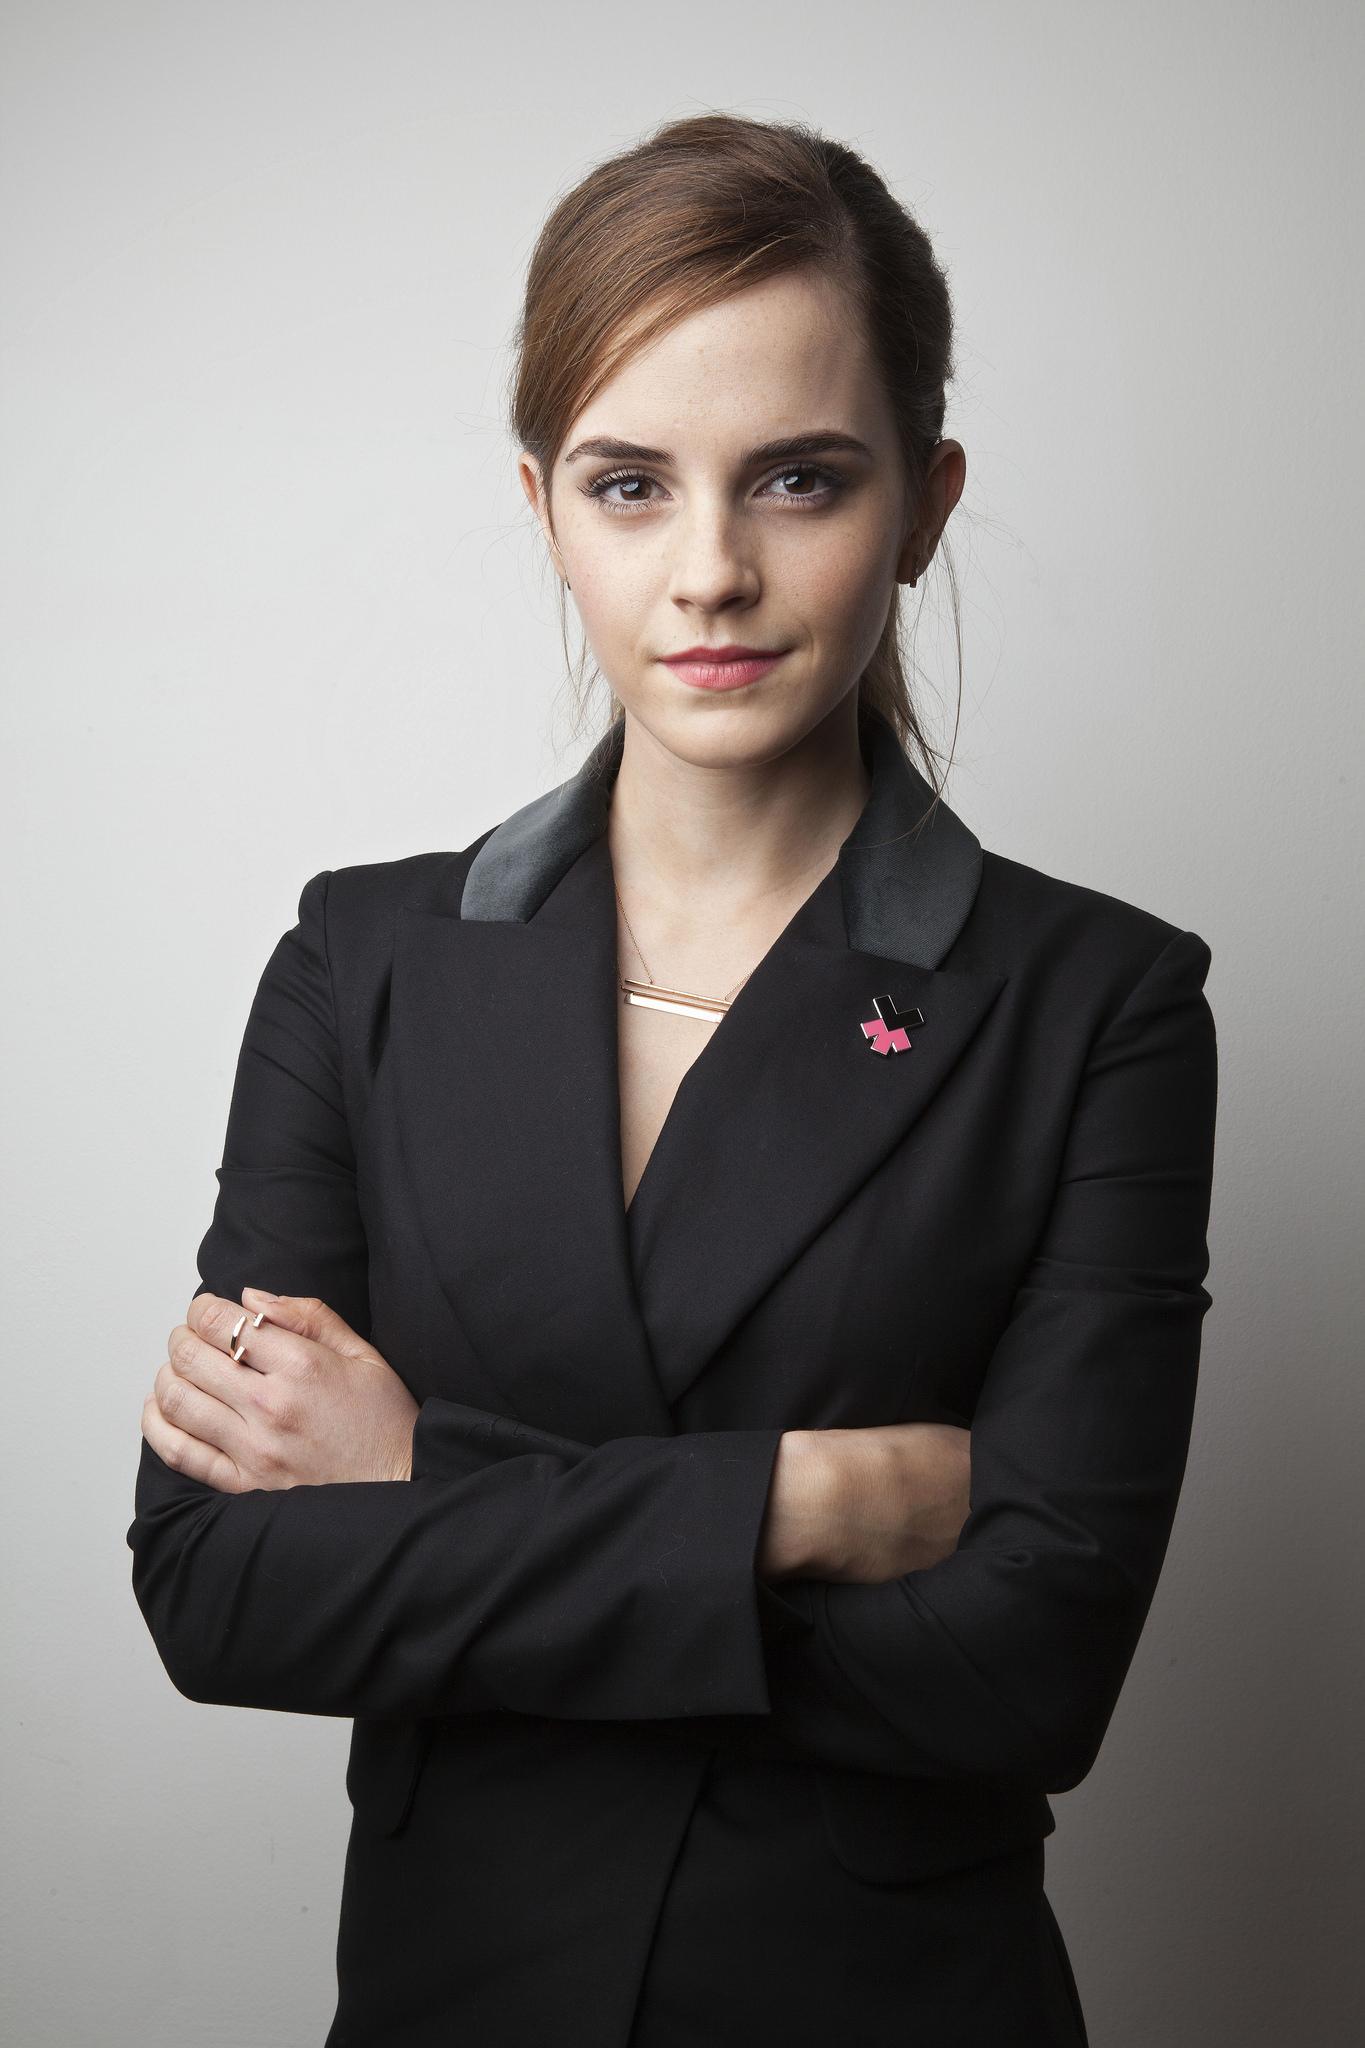 (Photo by UN Women)